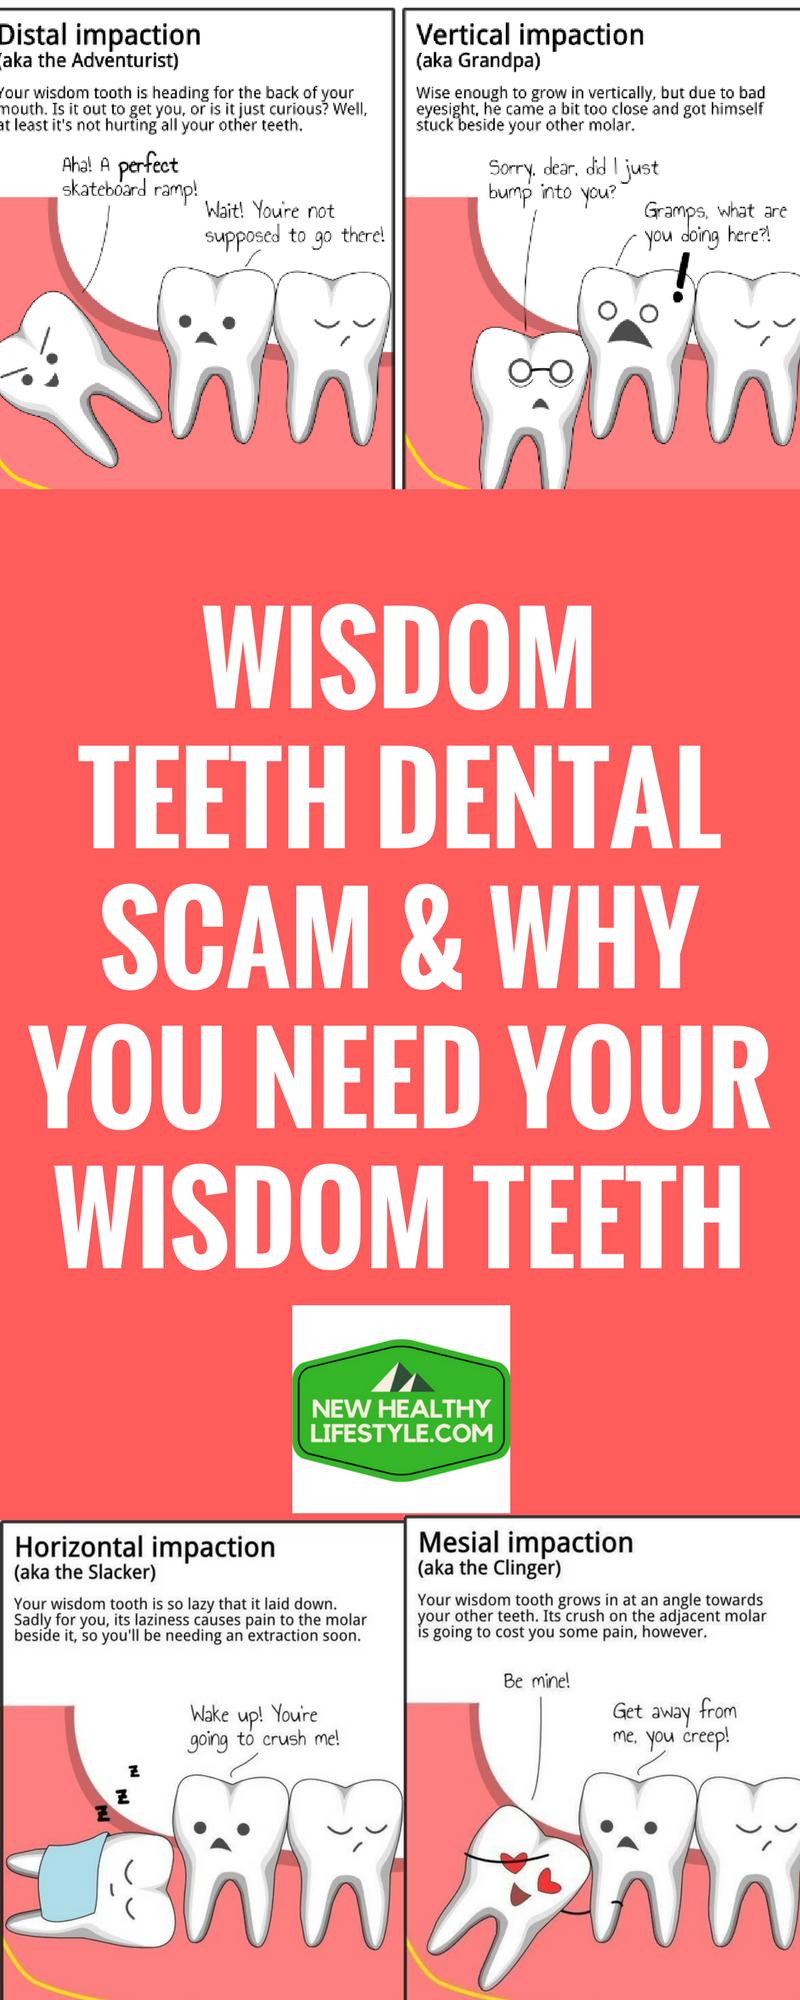 Goofy Wisdom Teeth Jokes Toothbrushholder Wisdomteethtimeline Wisdom Teeth Wisdom Teeth